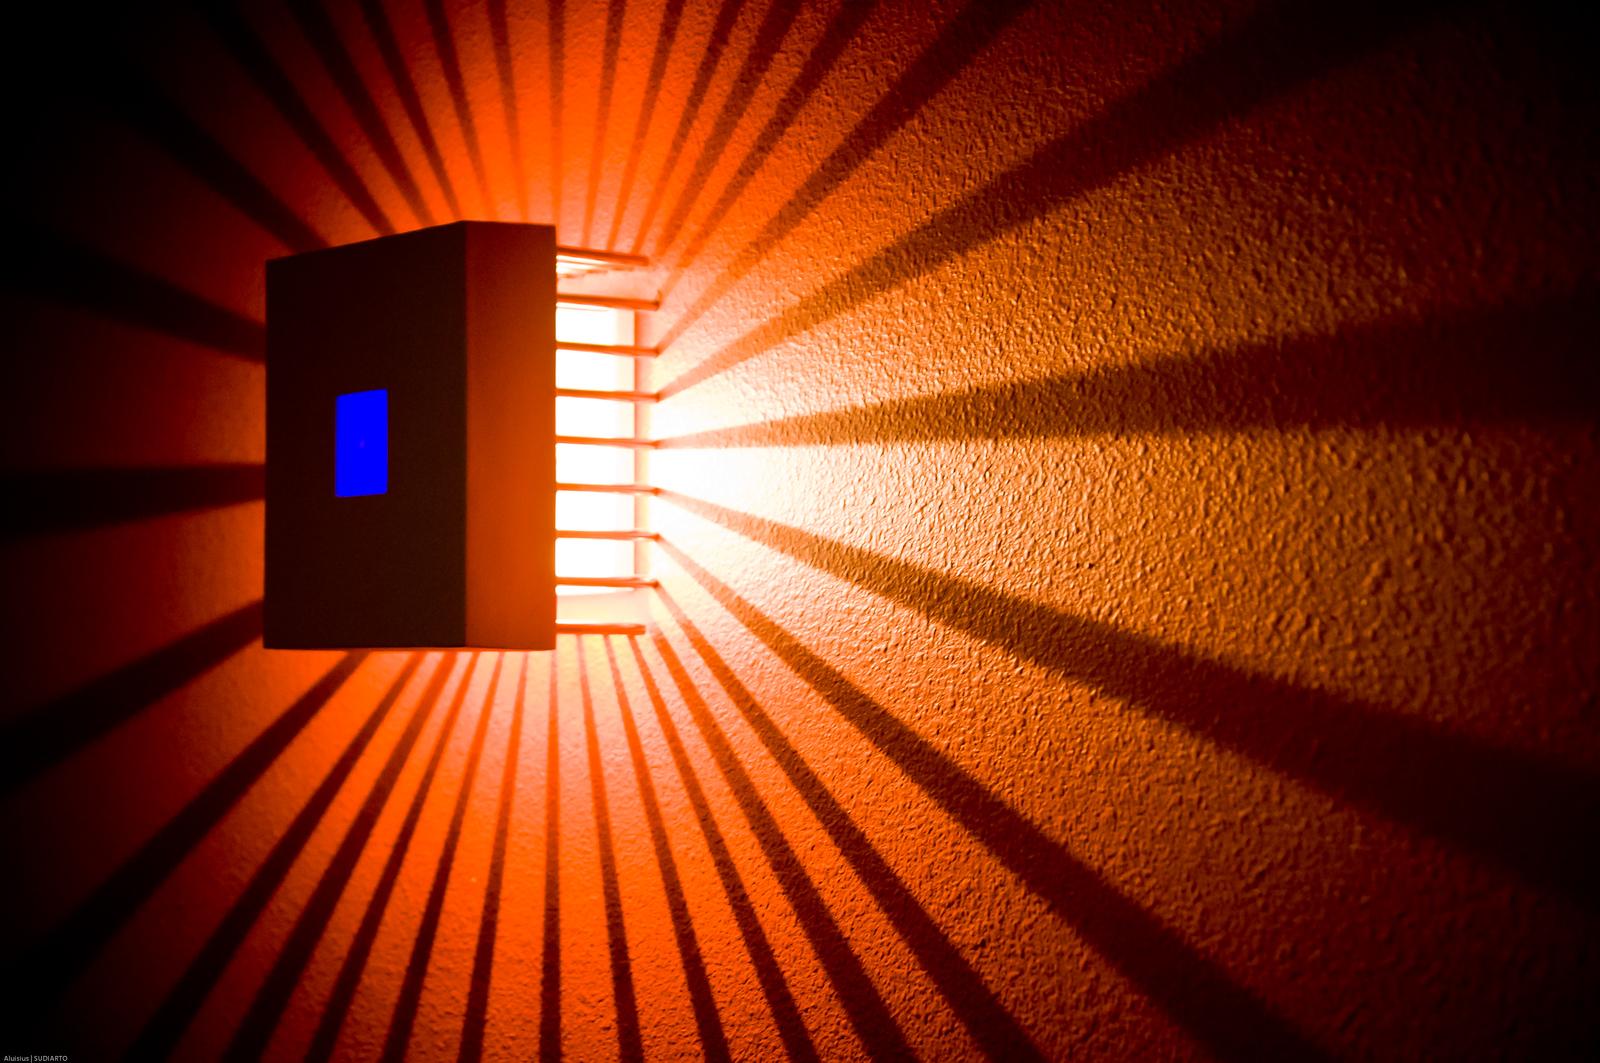 Light Diffraction